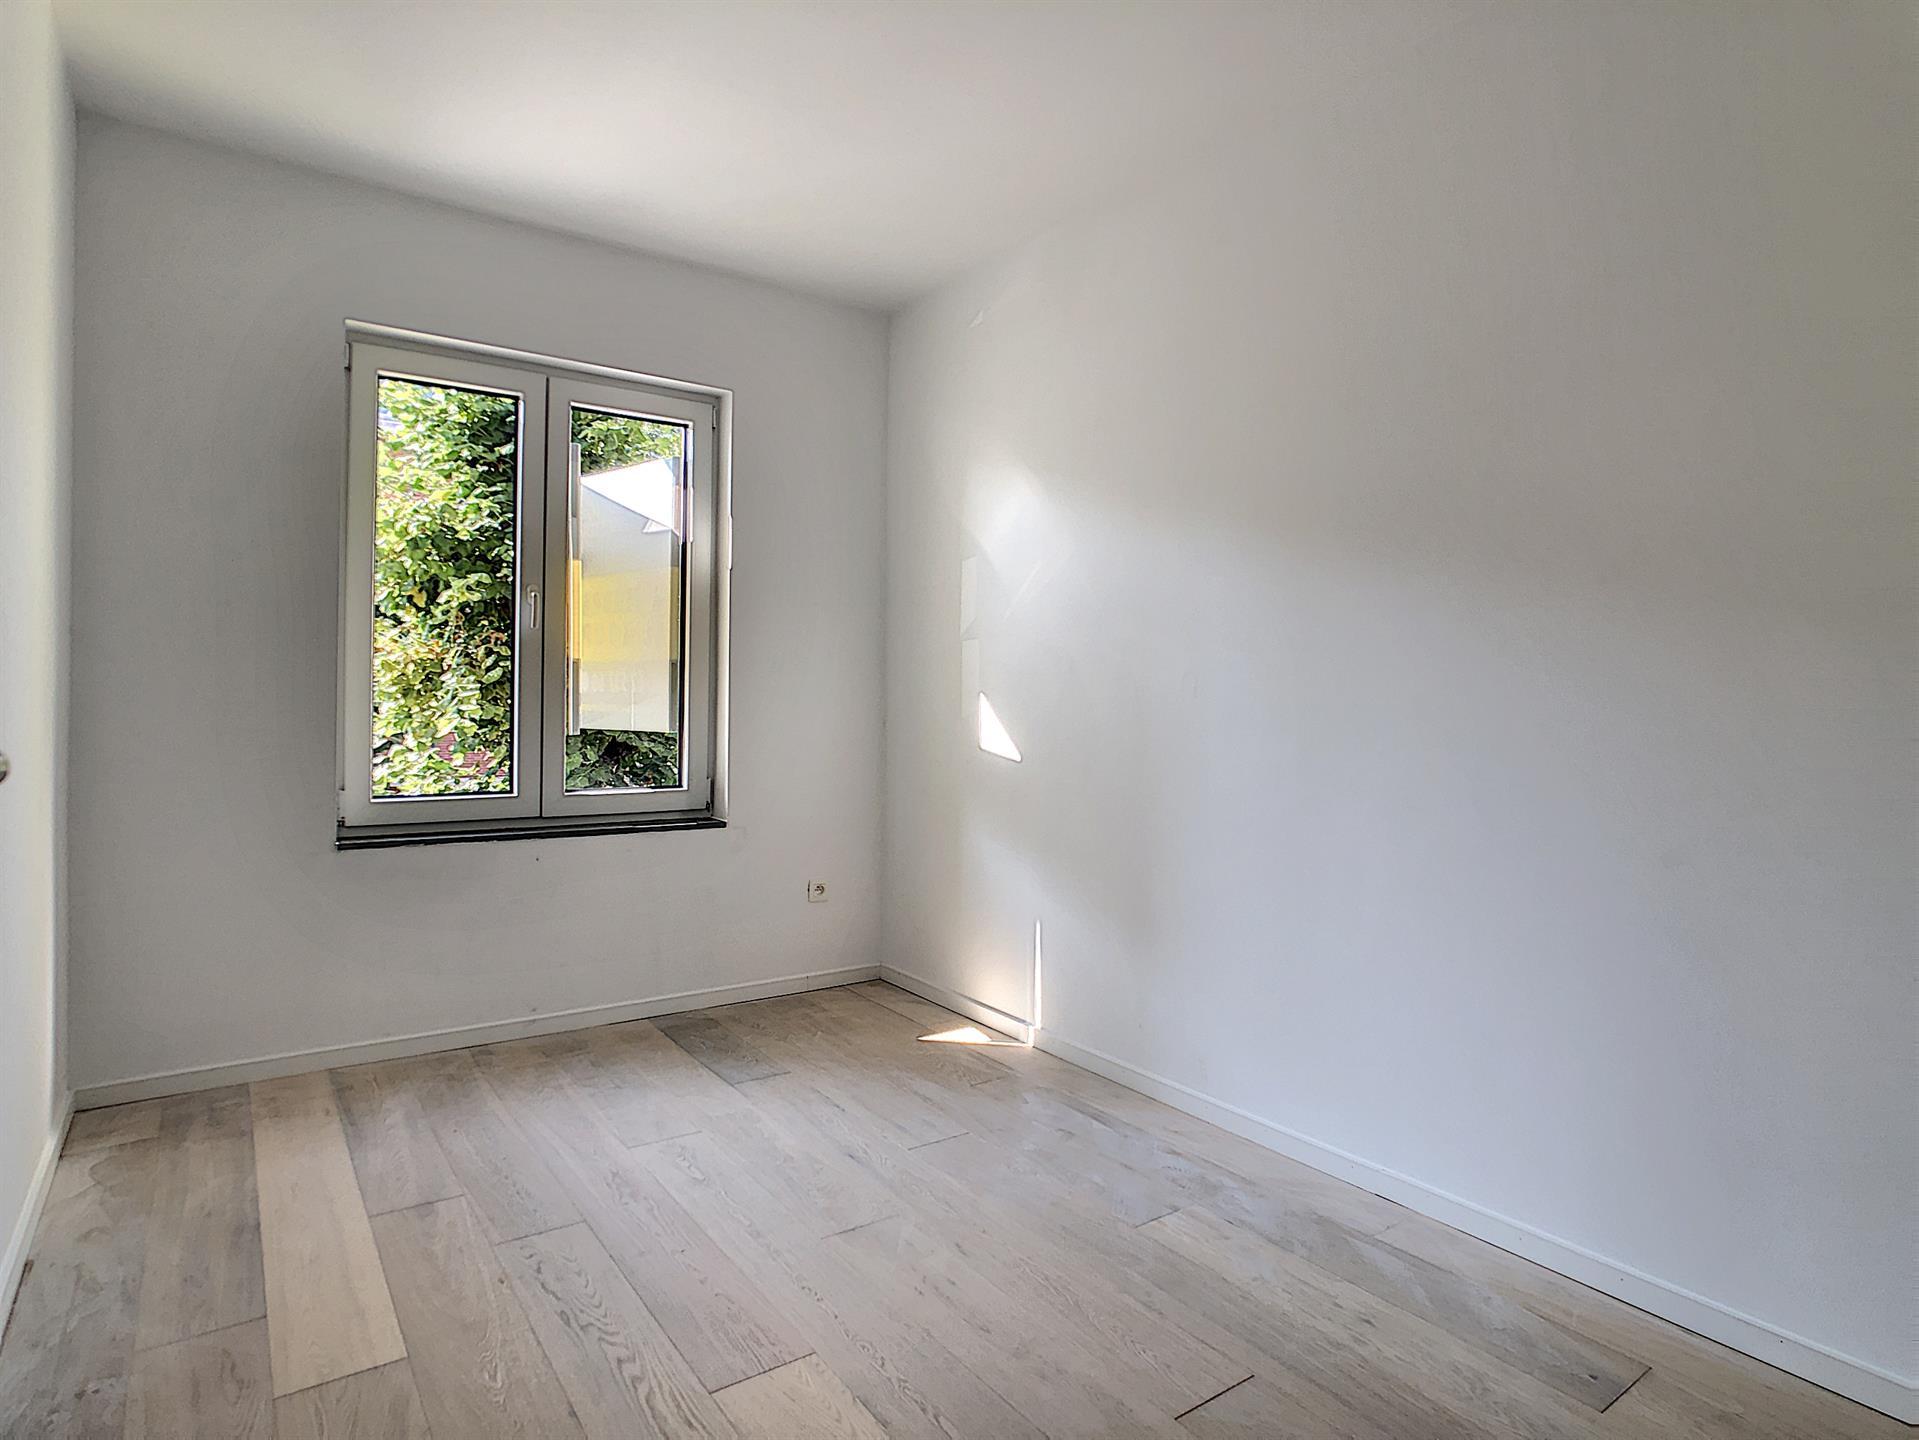 Appartement - Anderlecht - #4252375-23